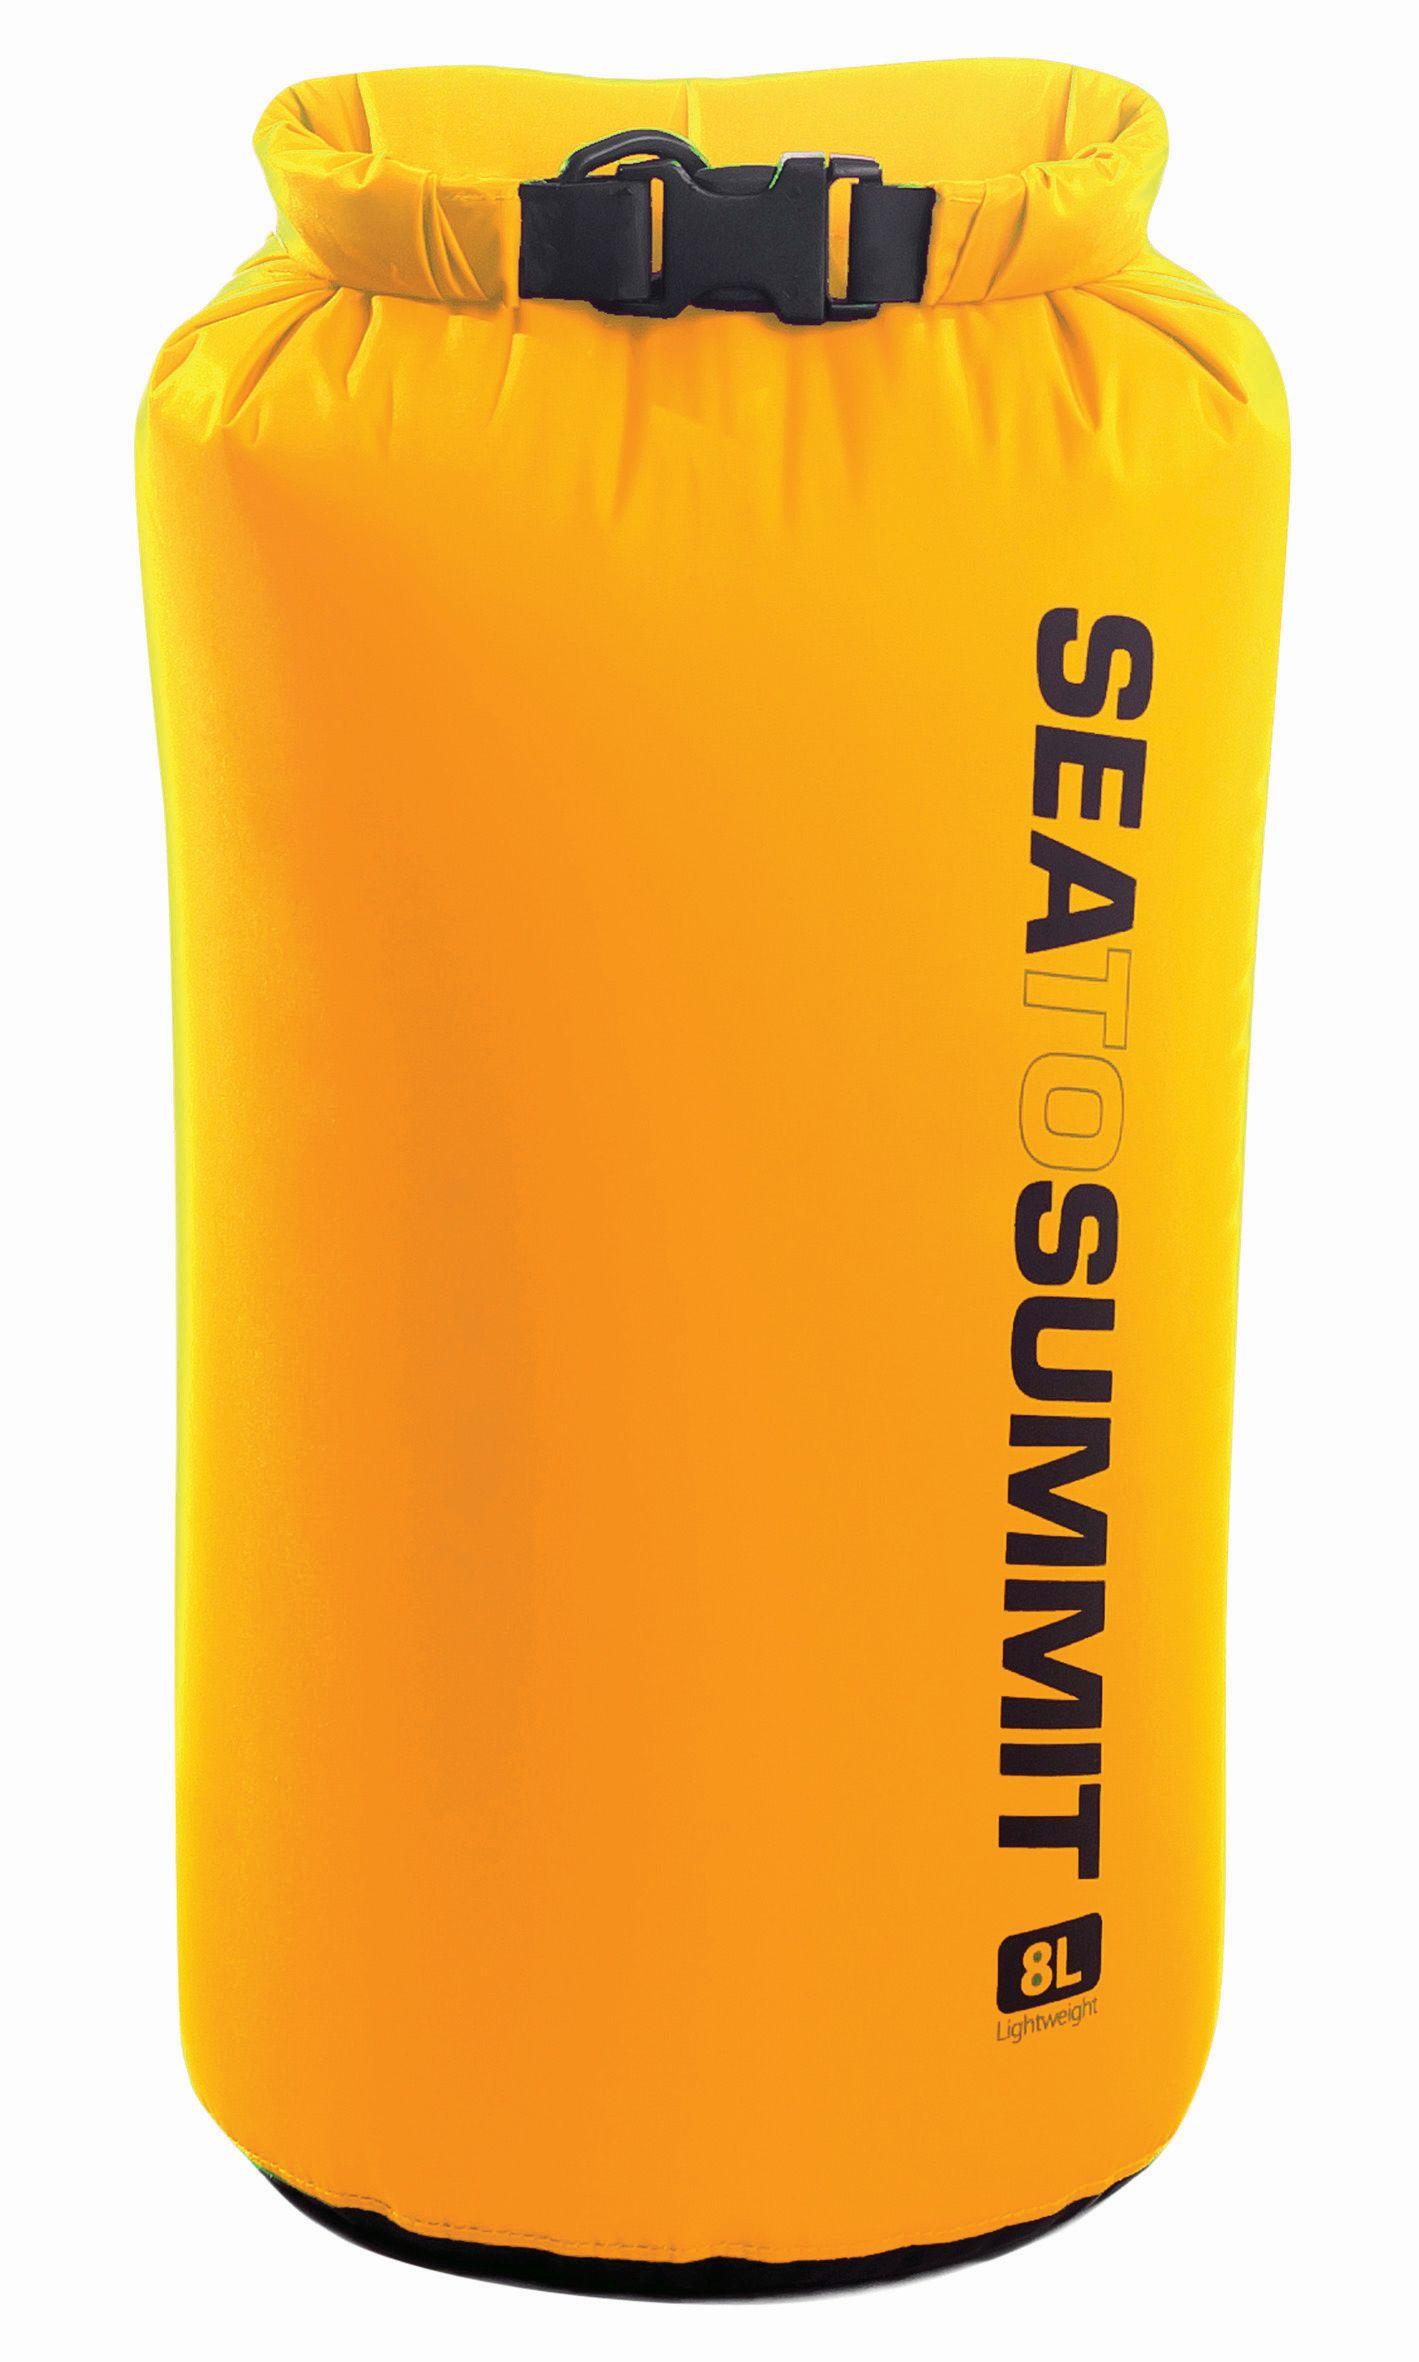 Sac Impermeabil Lightweight Dry Sack Sea To Summit 8l - Galben